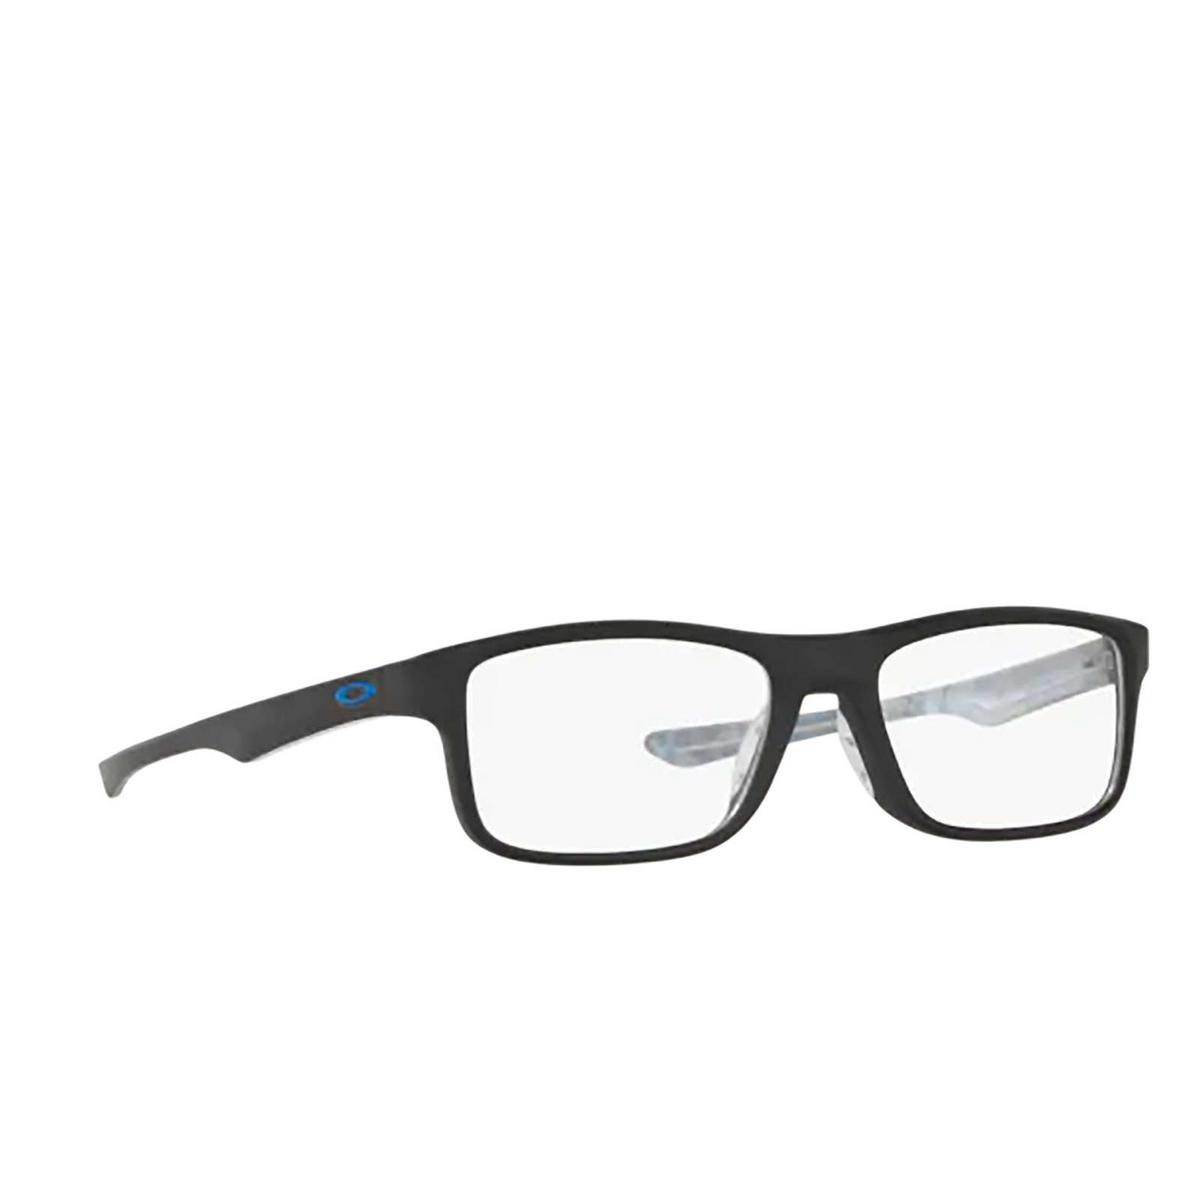 Oakley® Rectangle Eyeglasses: Plank 2.0 OX8081 color Satin Black 808101 - three-quarters view.